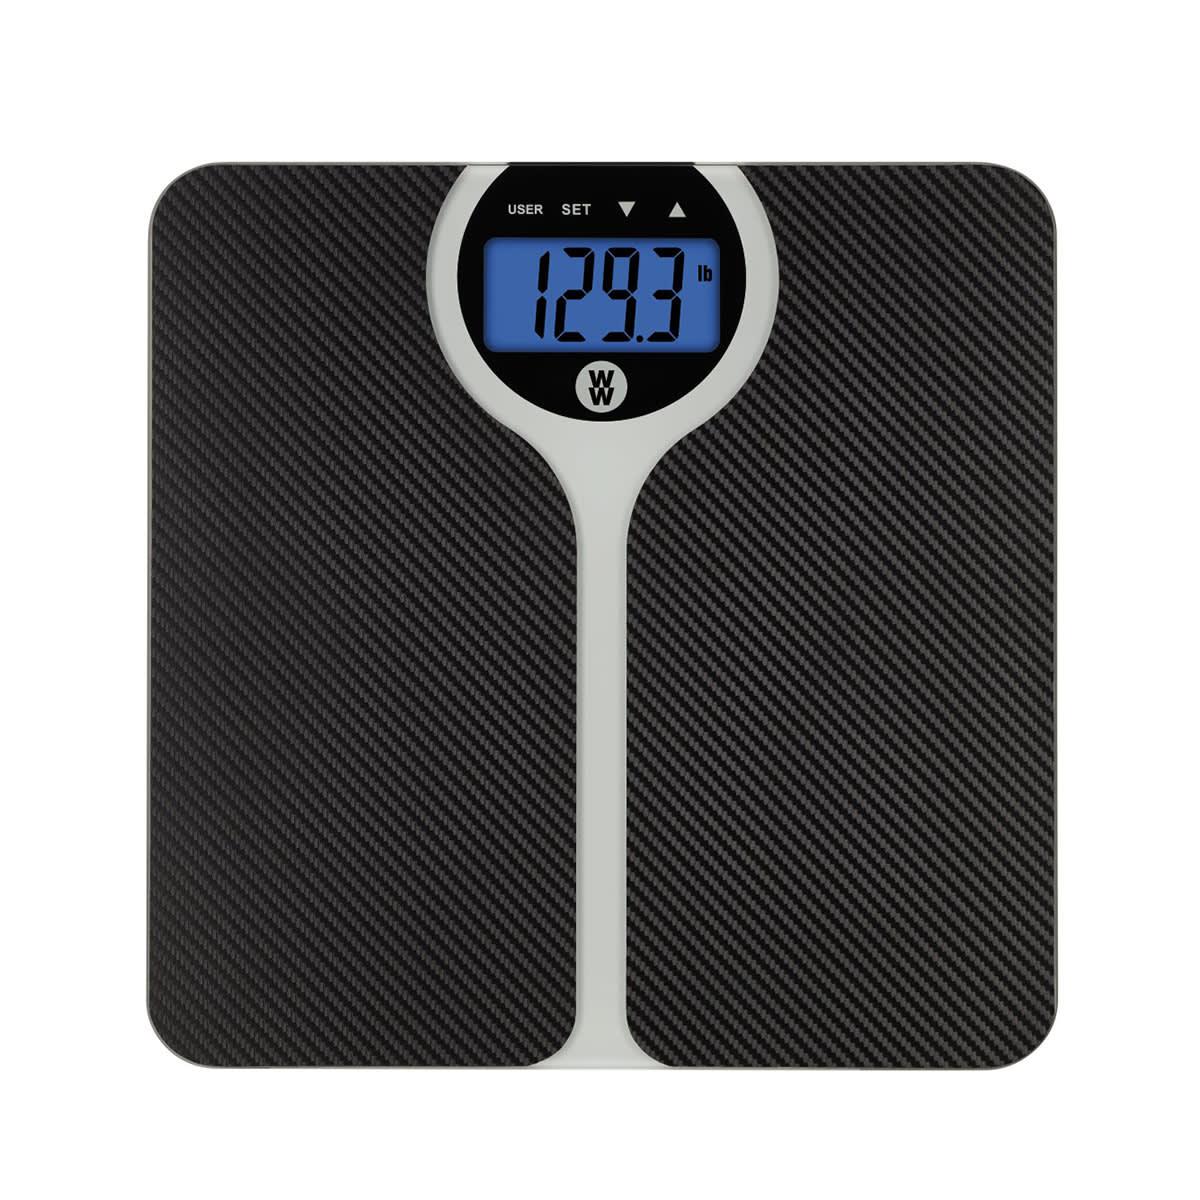 Ww Digital Weight Scale, Bathroom Weight Scales